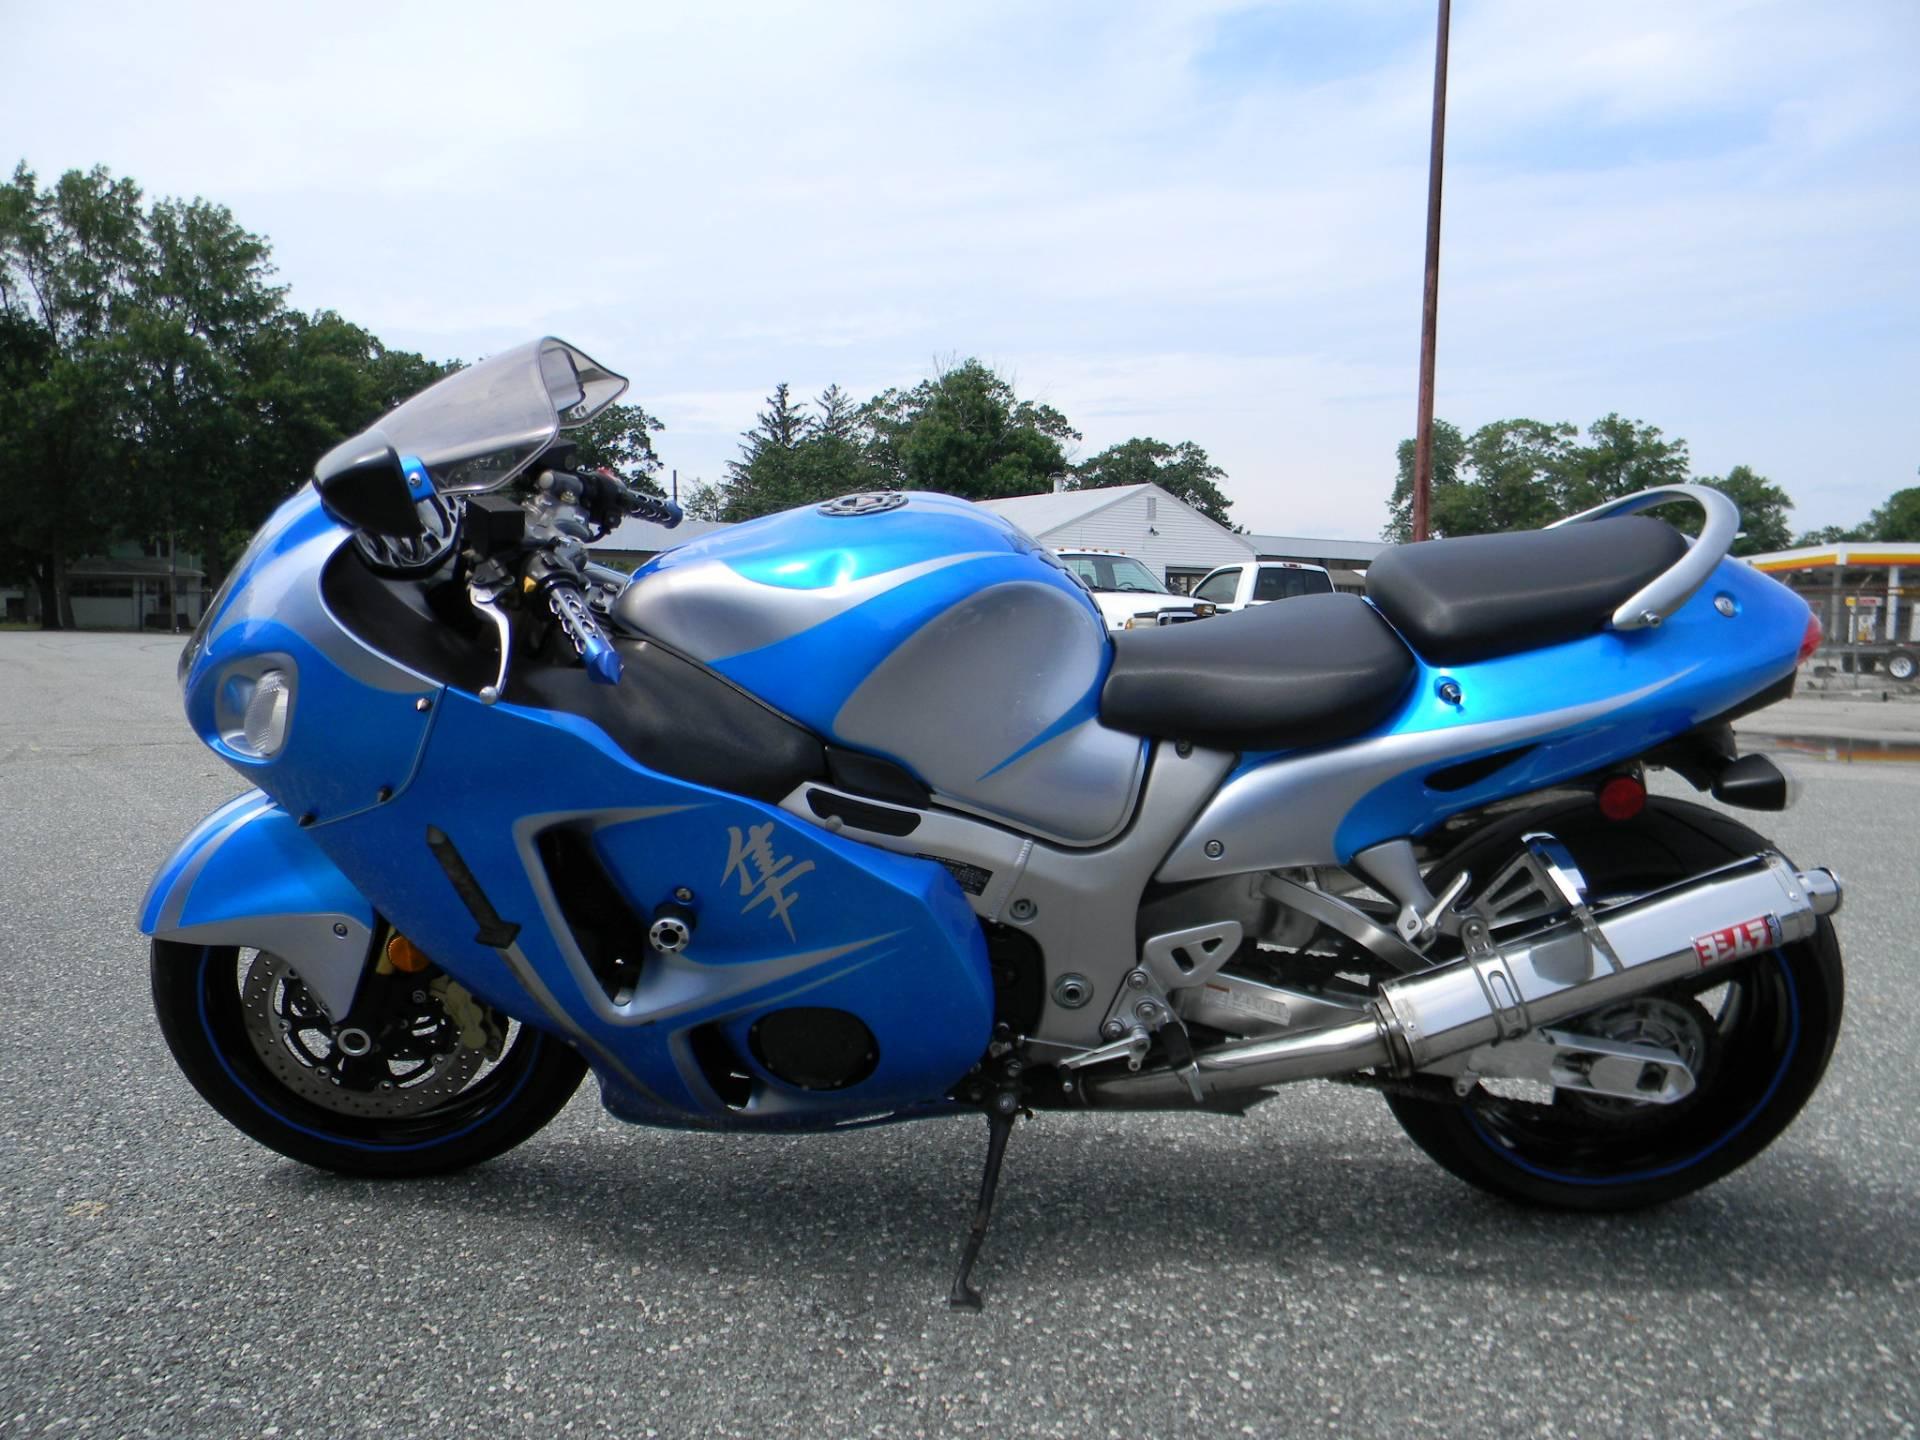 2005 Suzuki Hayabusa 5